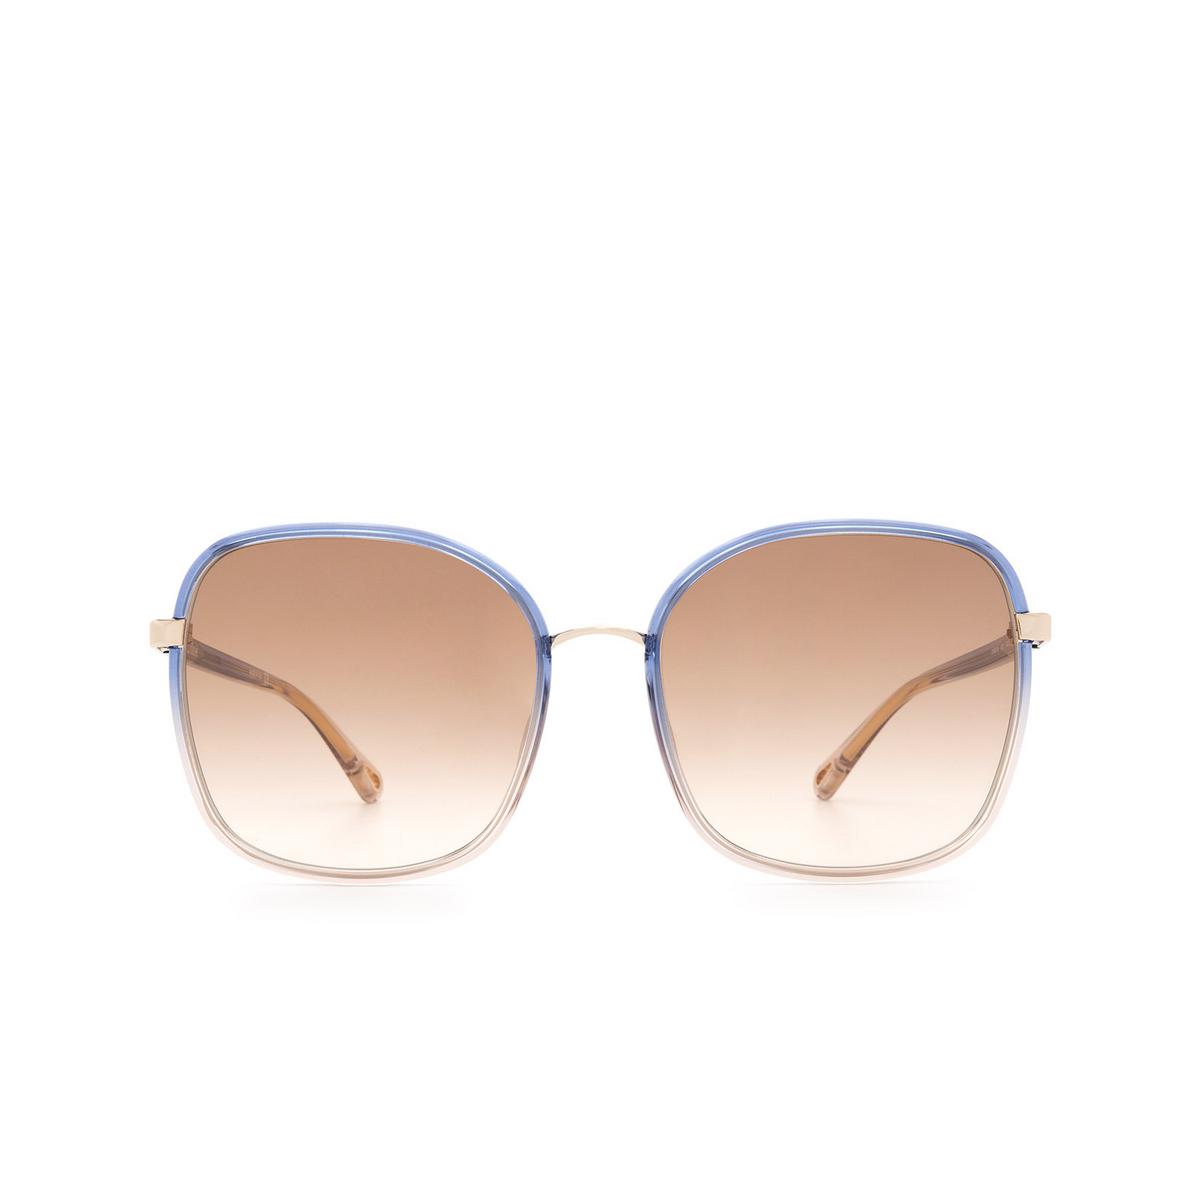 Chloé ® Square Sunglasses: CH0031S color Blue 003.